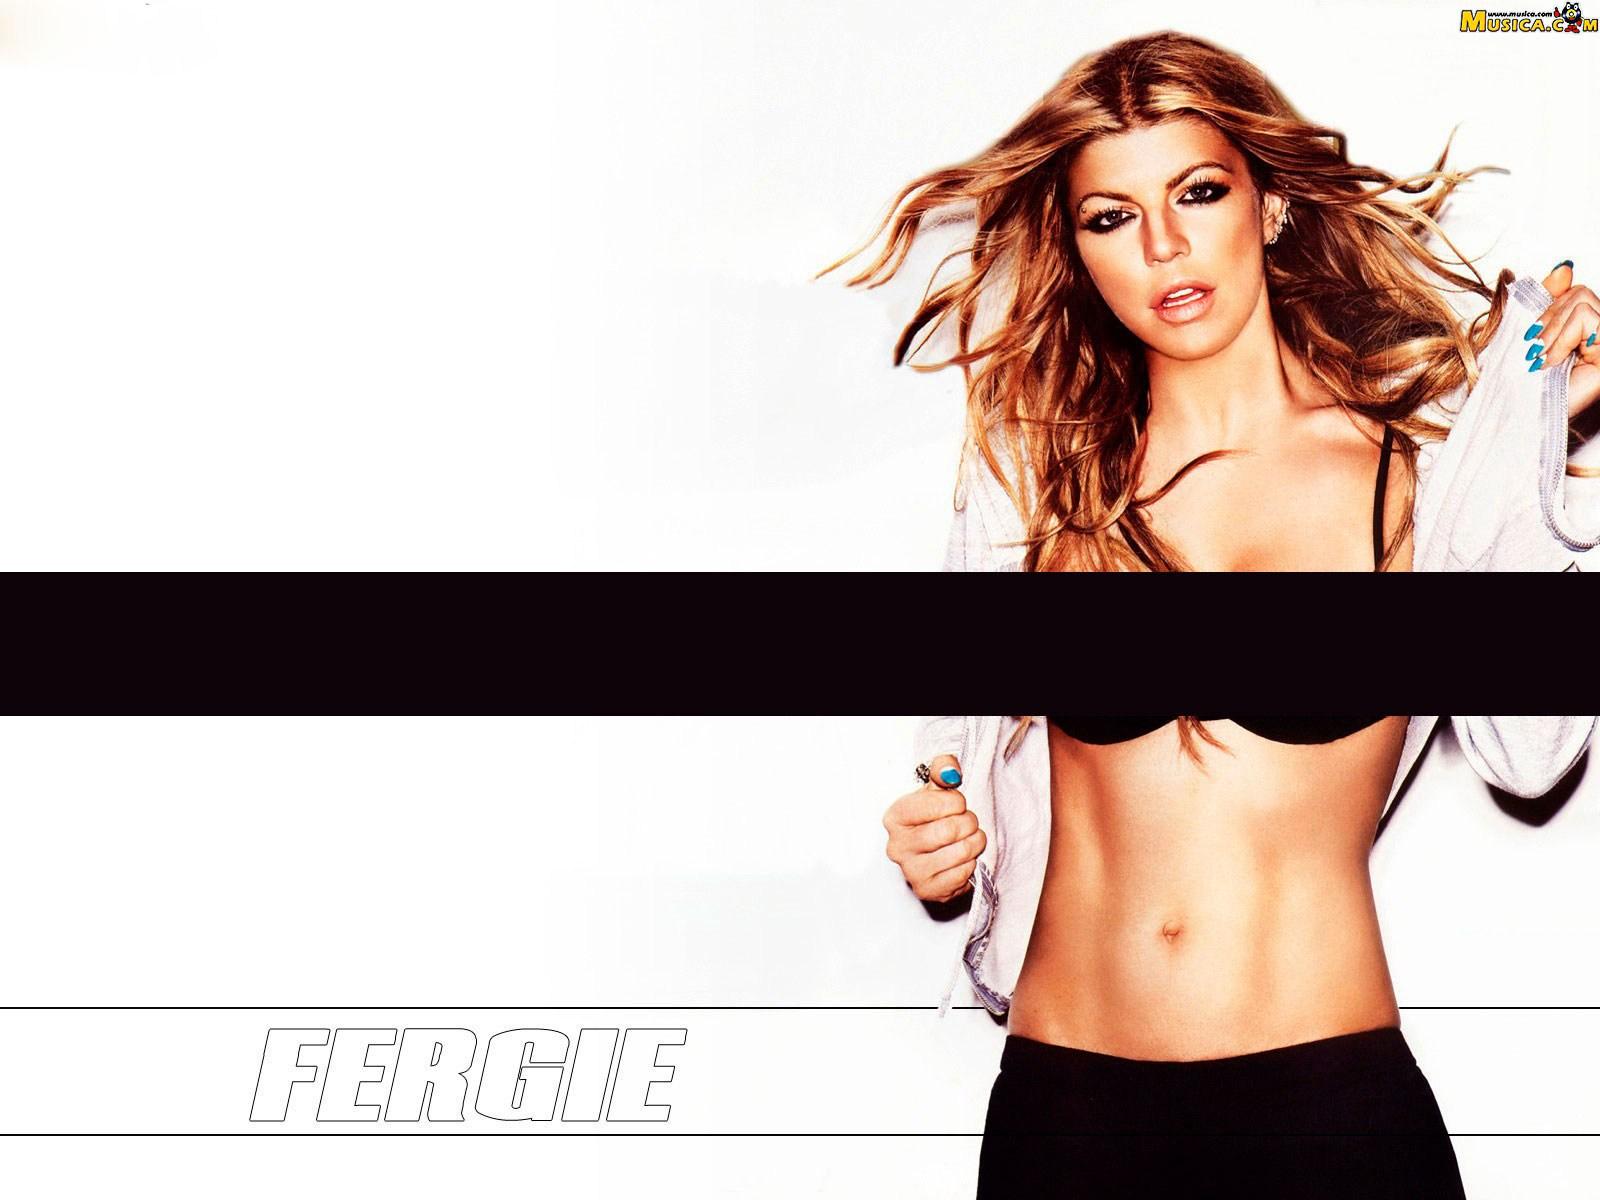 Fondo de pantalla de Fergie